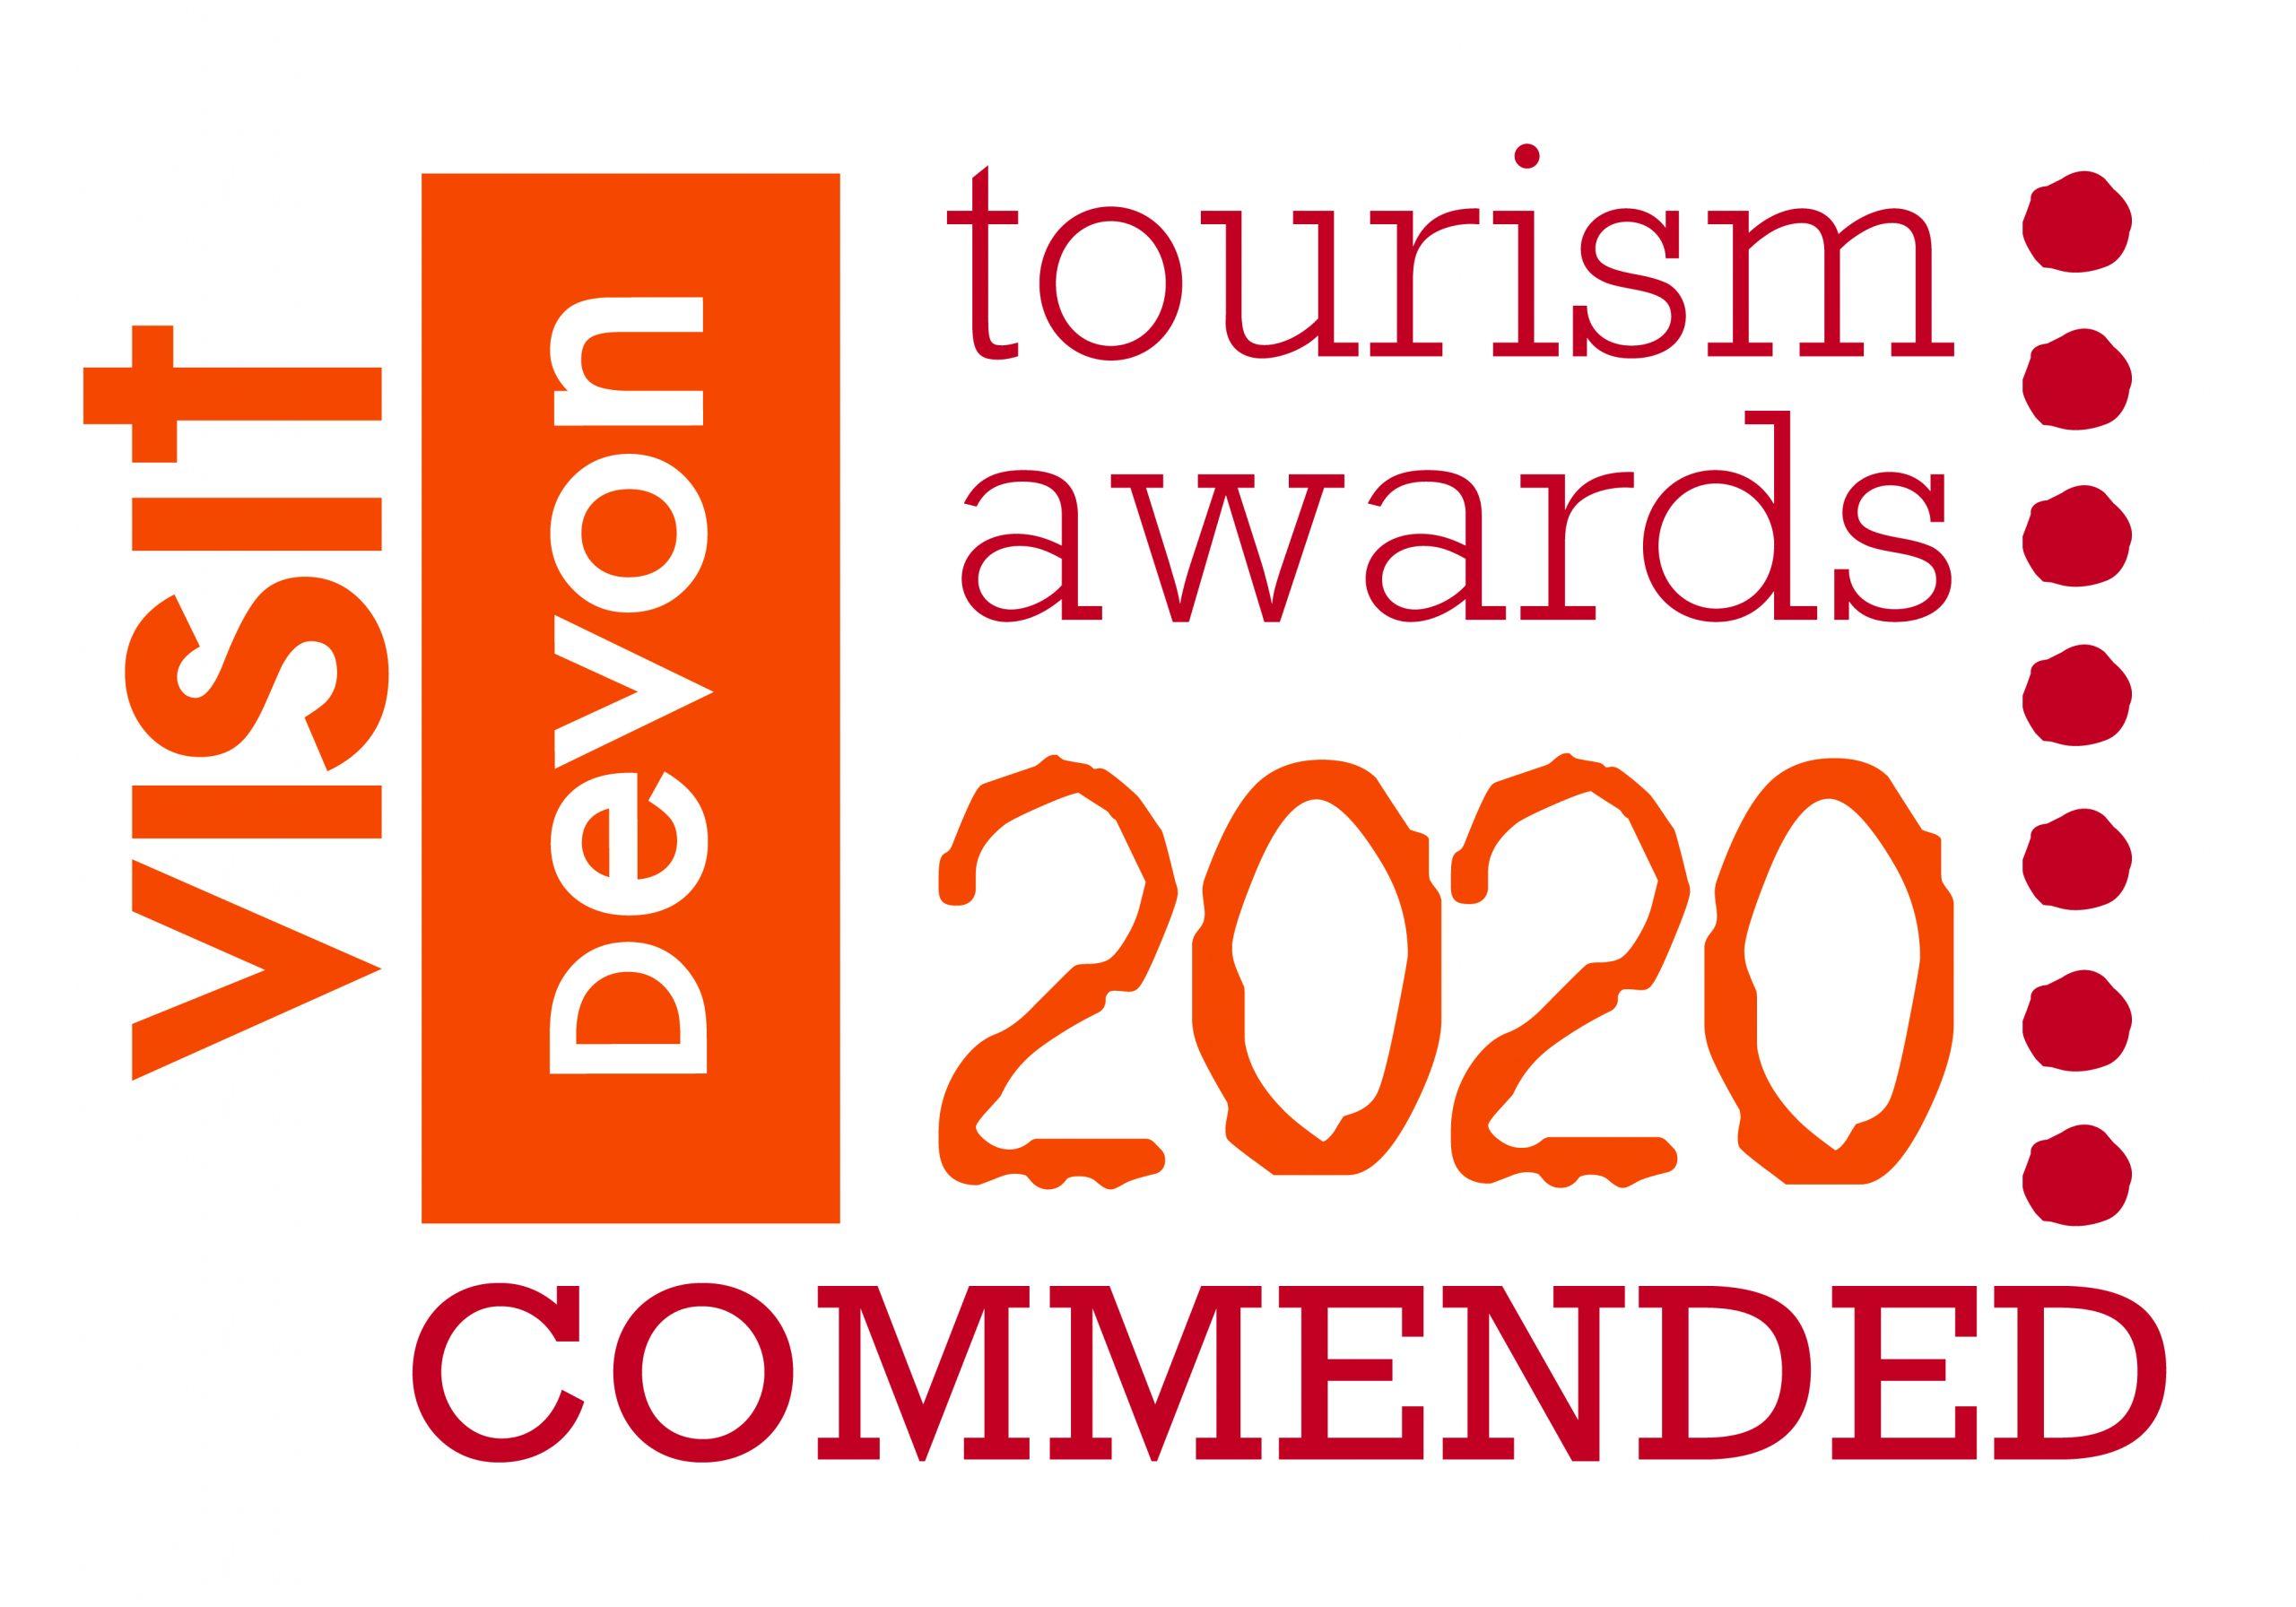 Devon Tourism 2020 Commended award